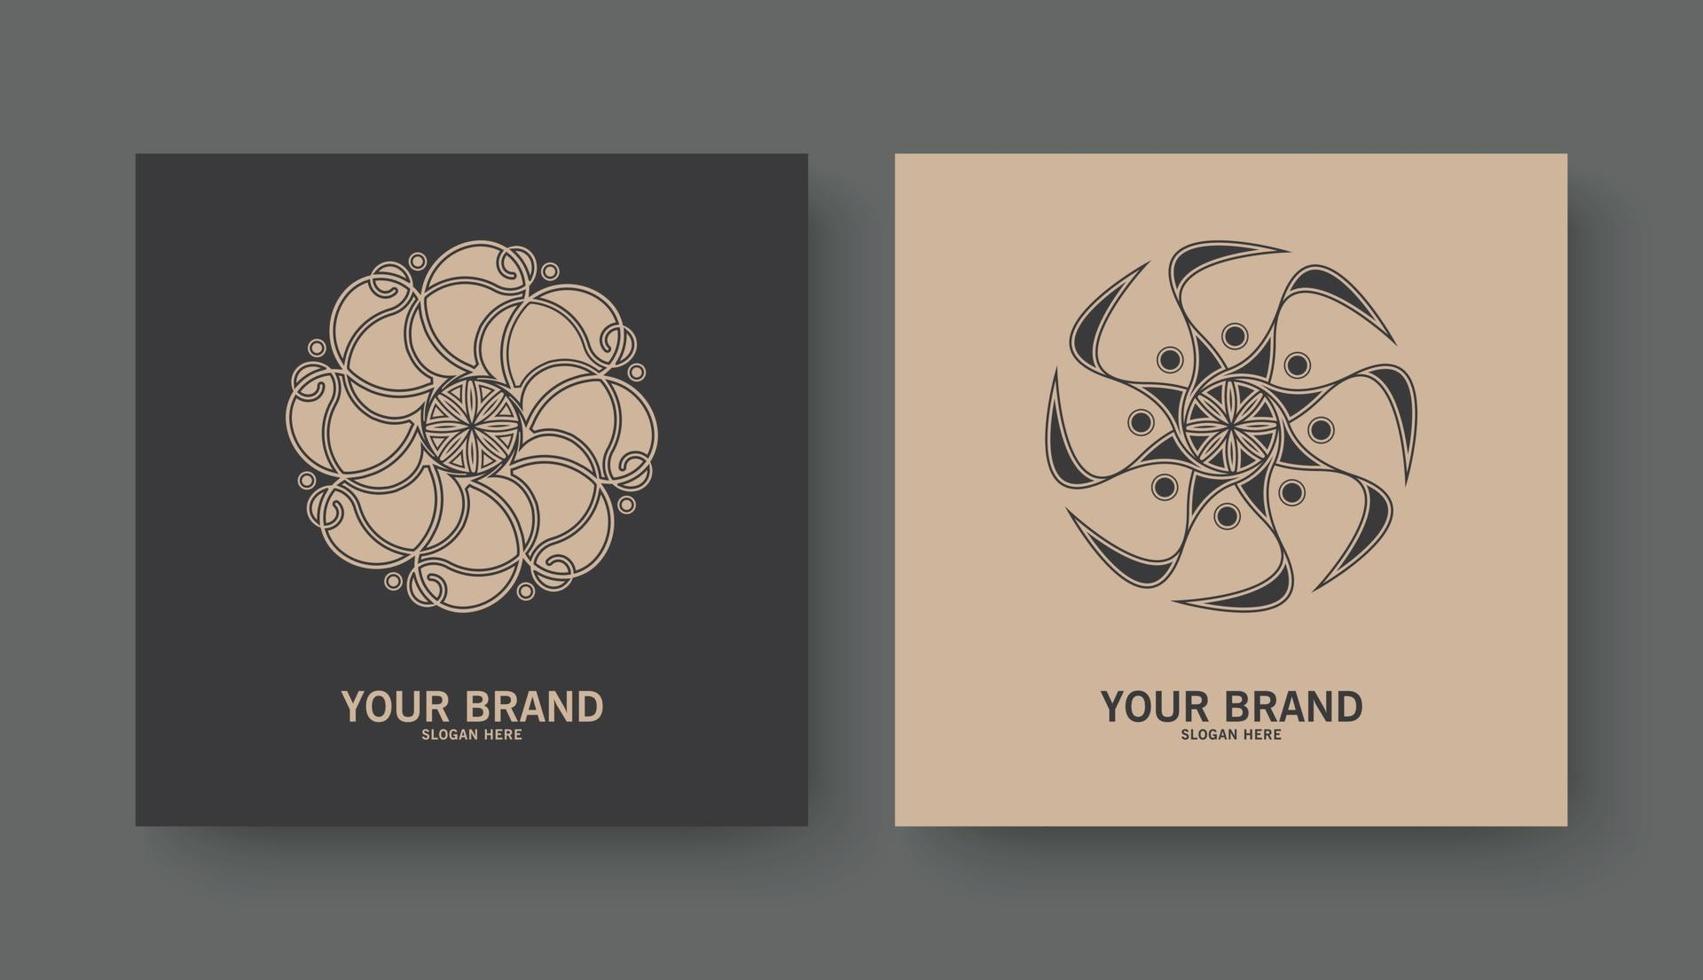 retro blommig logotyp med prydnadsdesign vektor